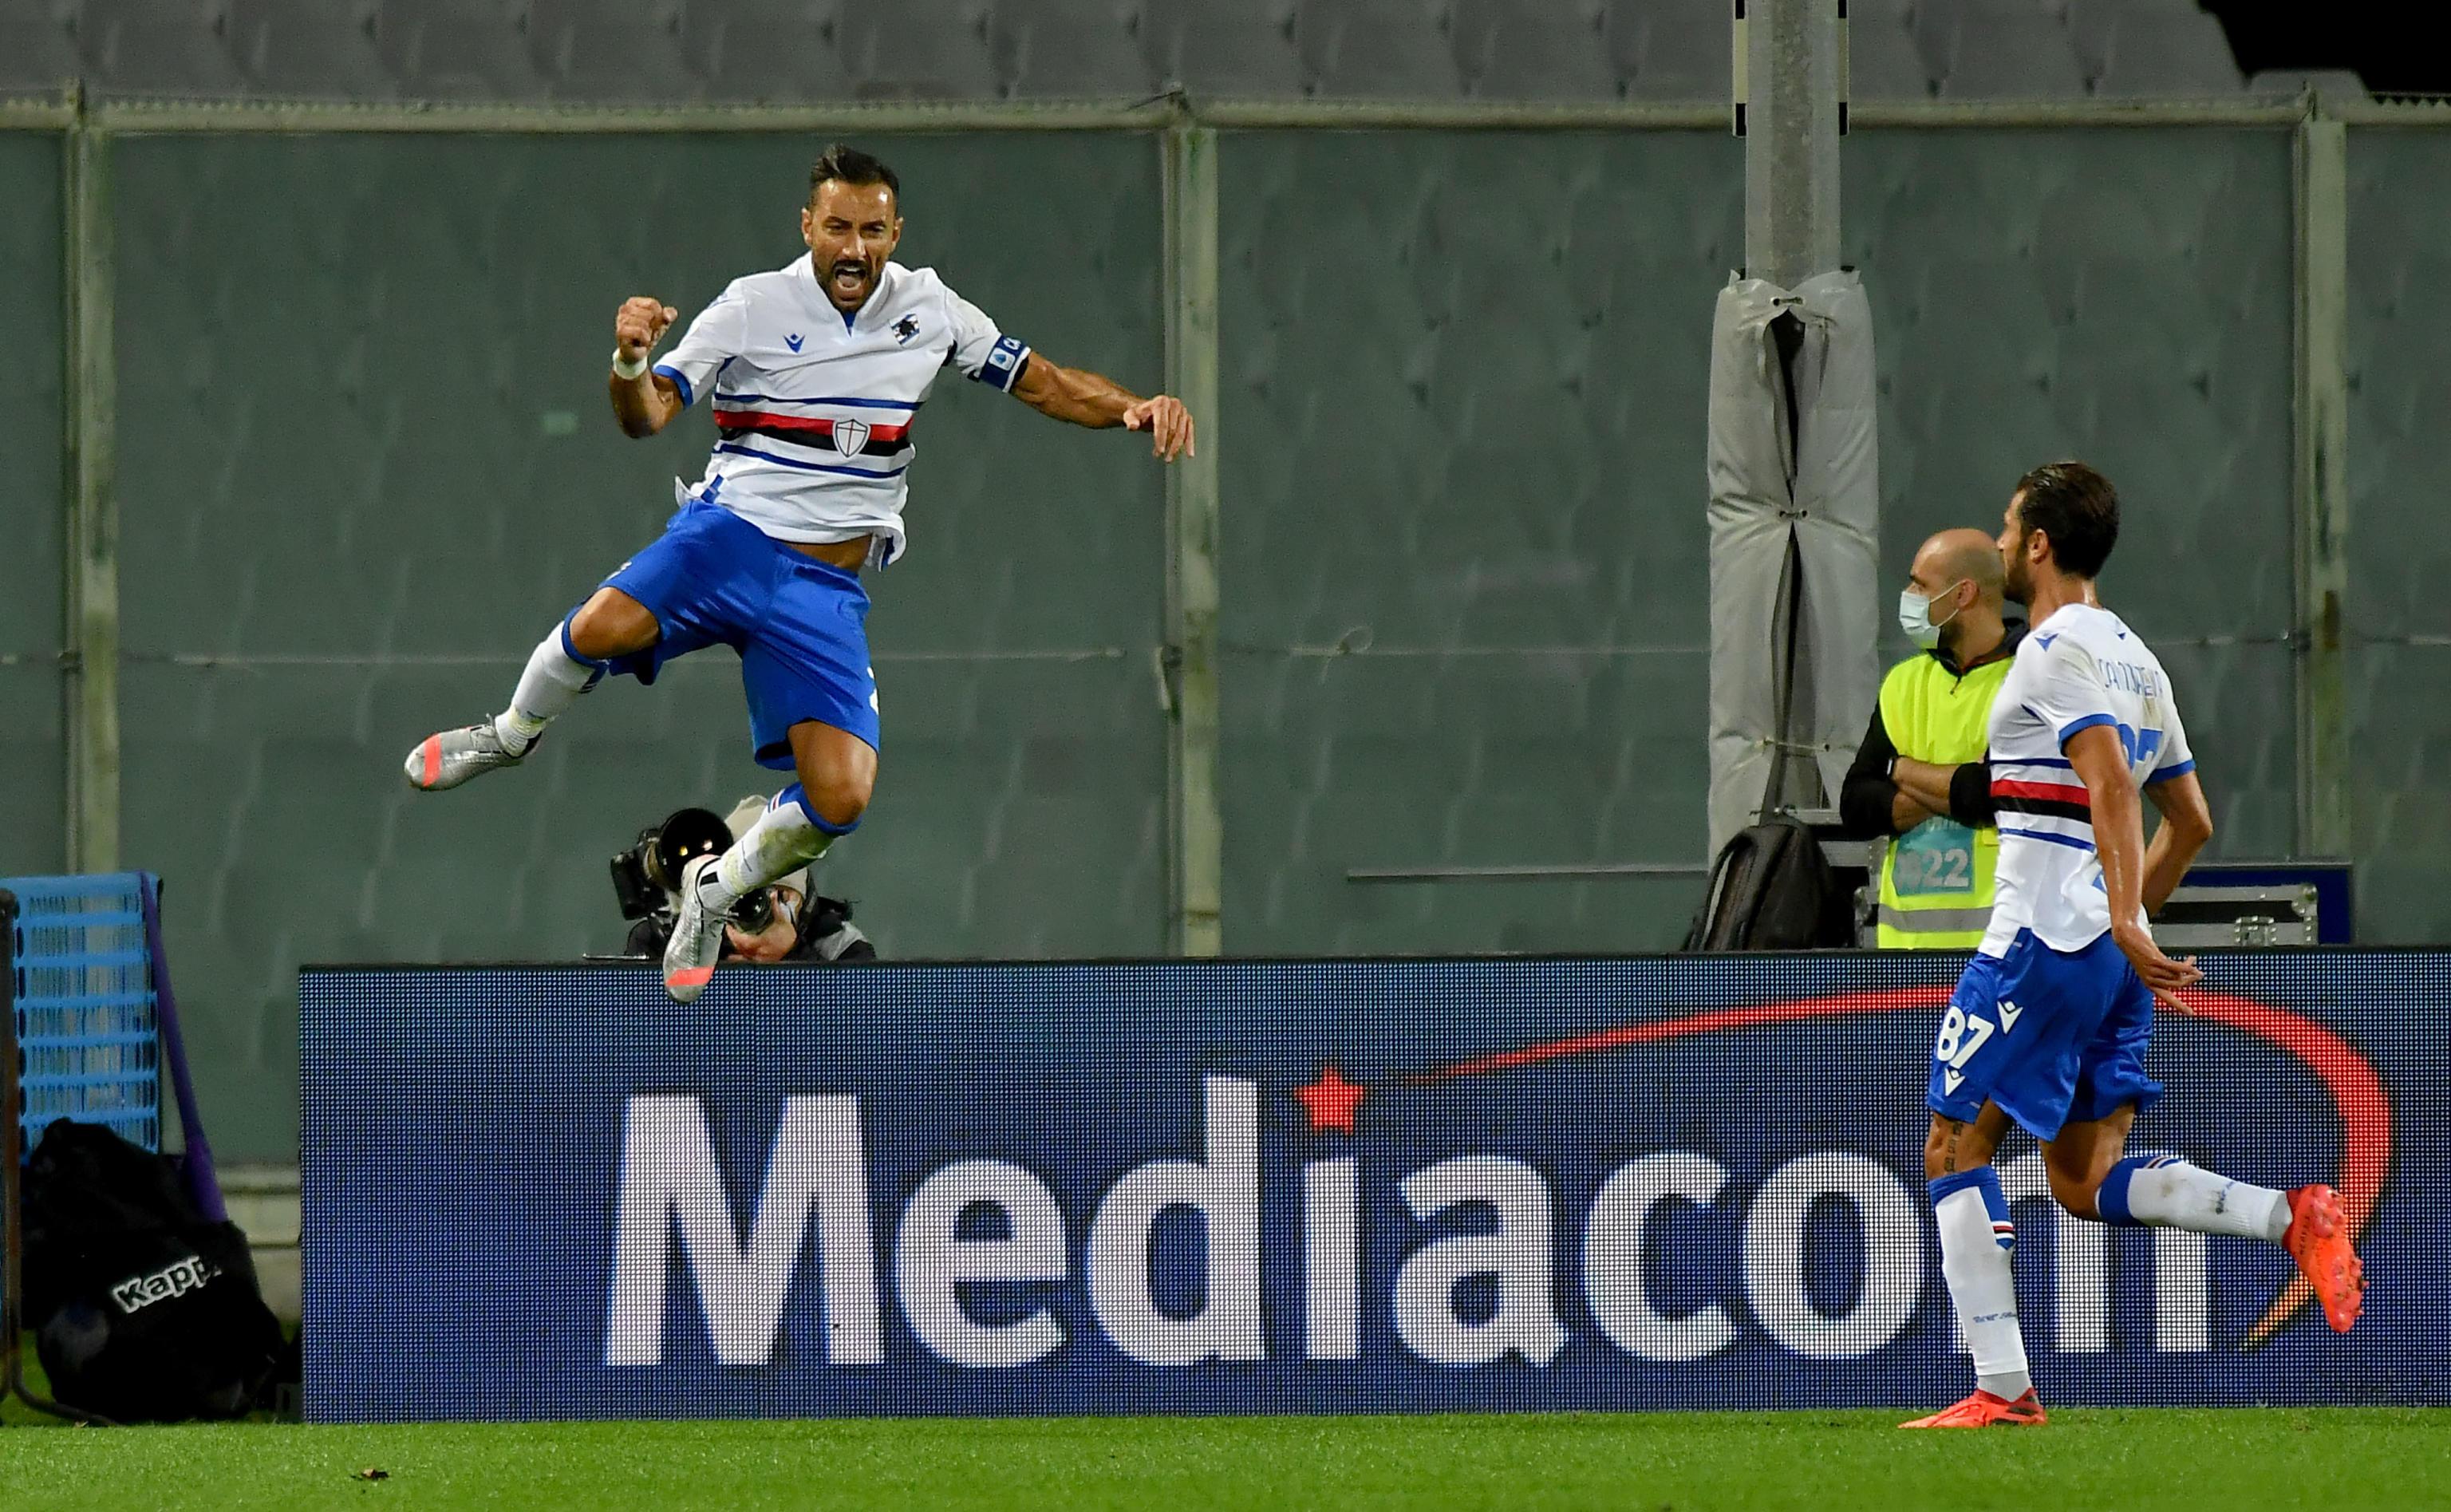 Fiorentina-Sampdoria 1-2: video, gol e highlights della partita di Serie A